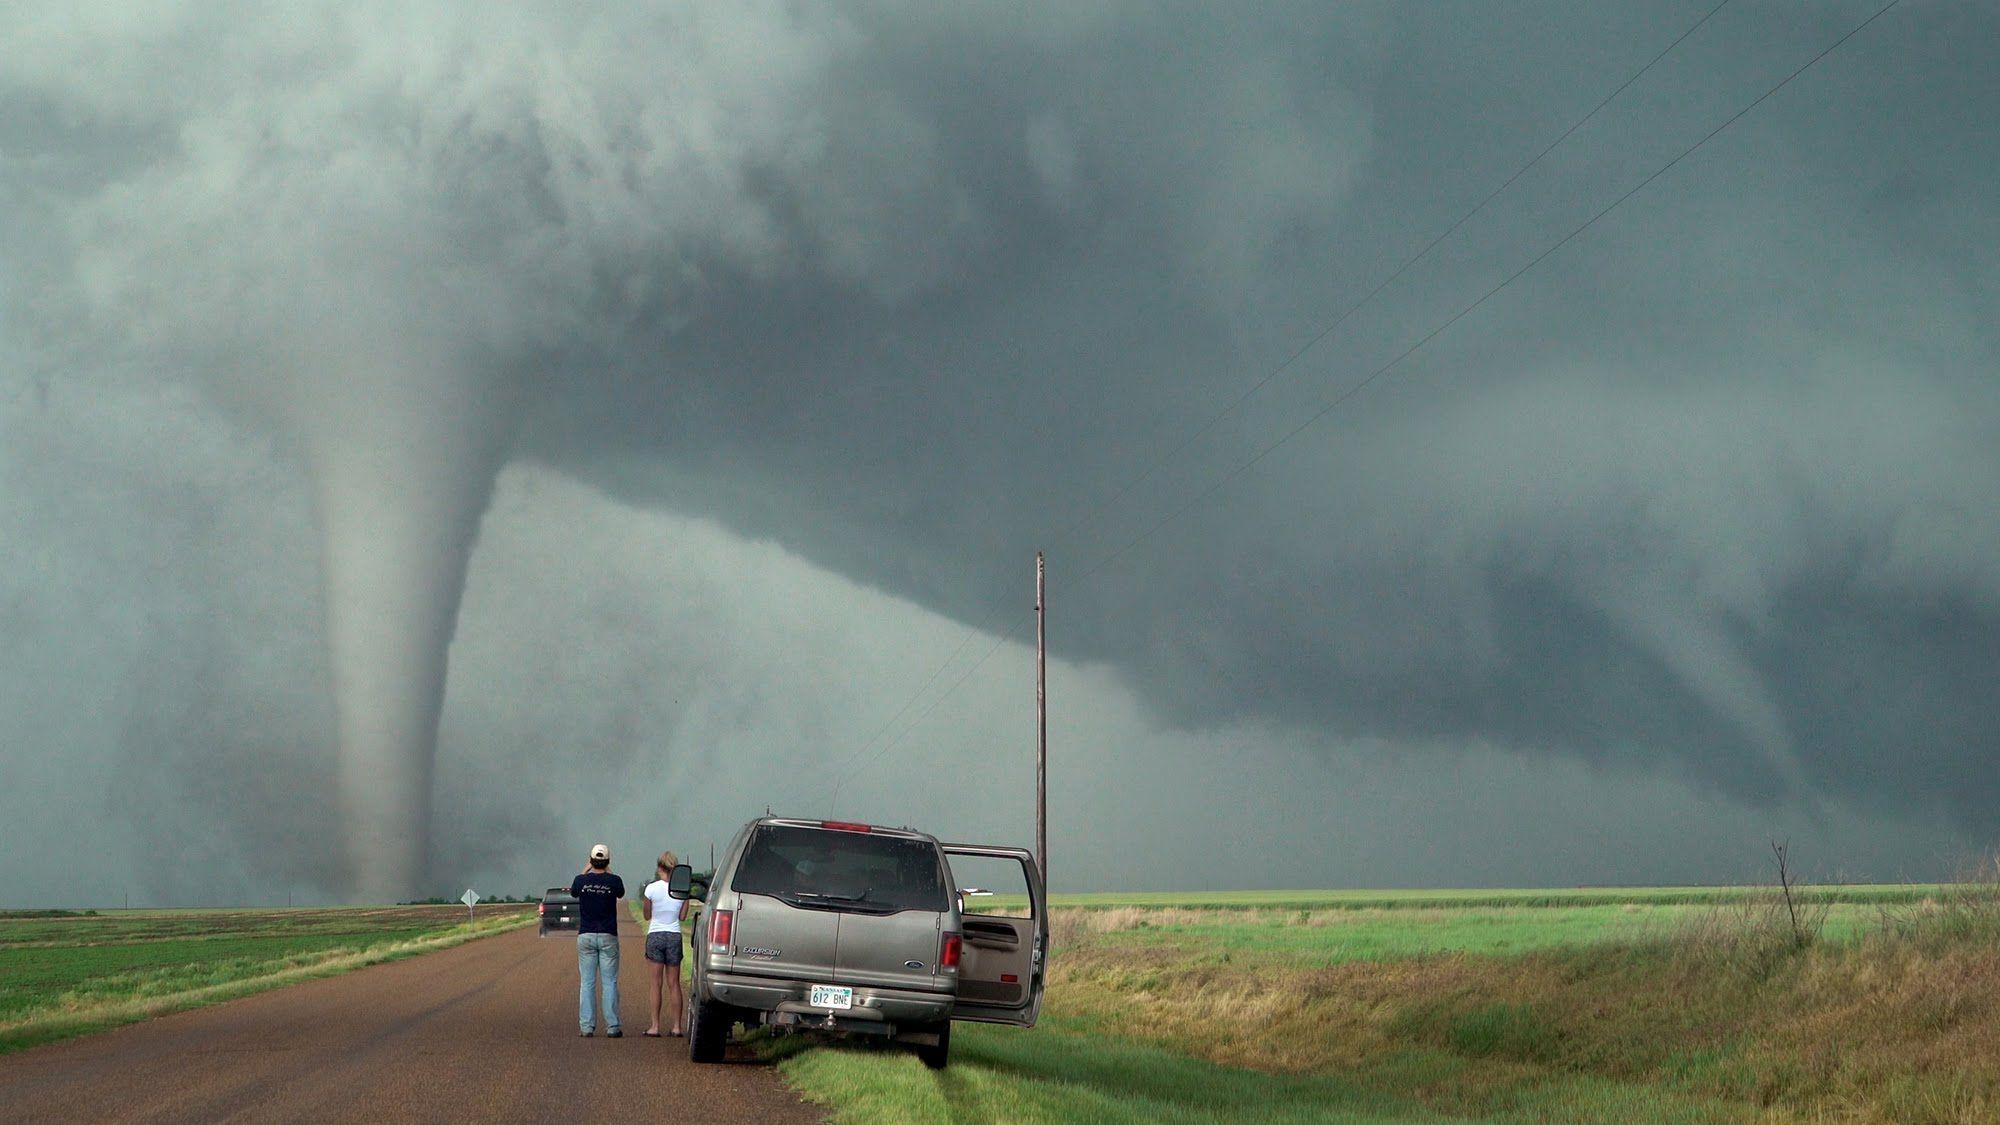 Tornado Twins Triplets Unusual Twisted Tornado Family Of May